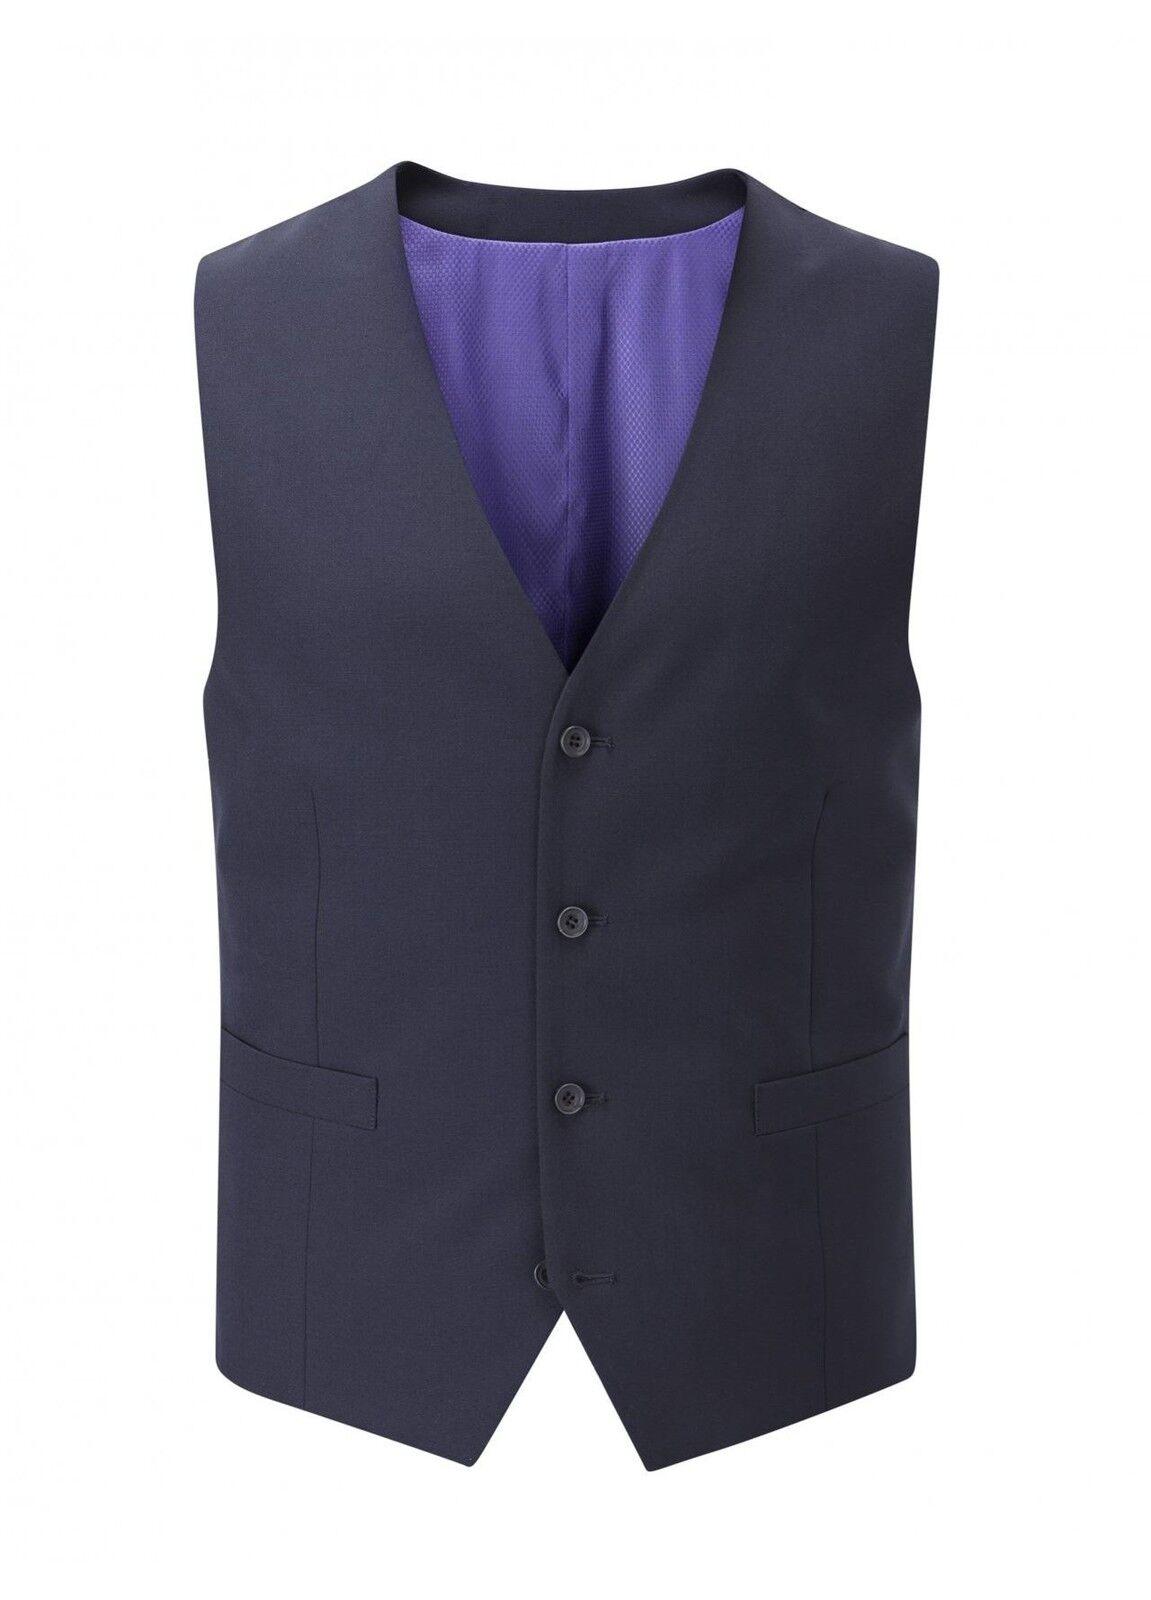 SKOPES Darwin Plain Navy Mens Formal Waist Coat